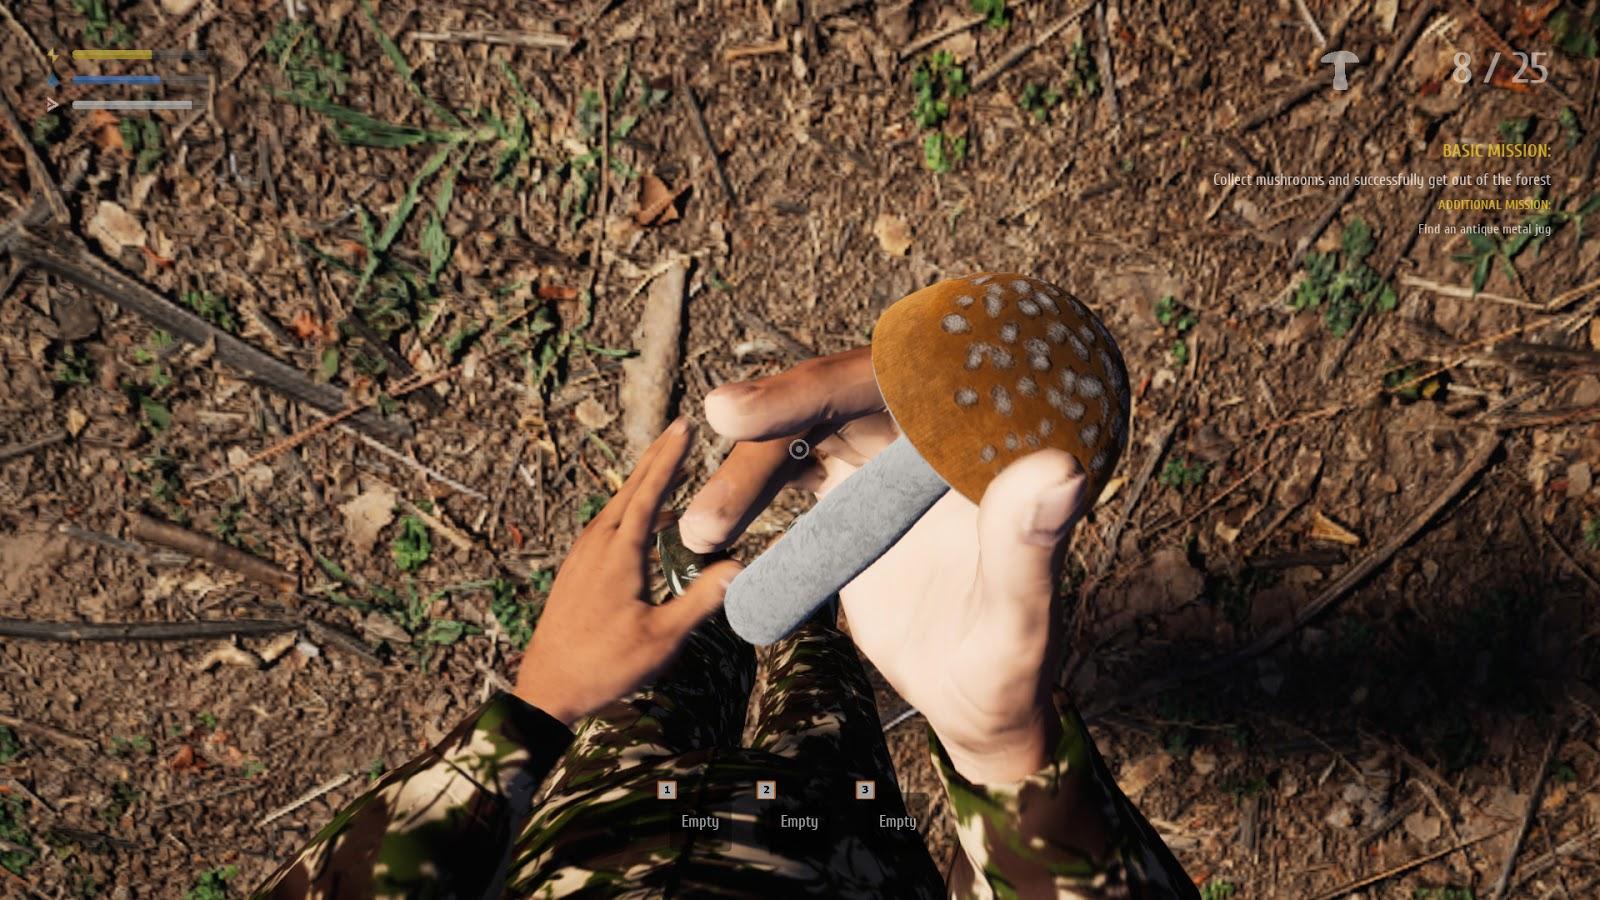 mushroom-picker-simulator-pc-screenshot-02